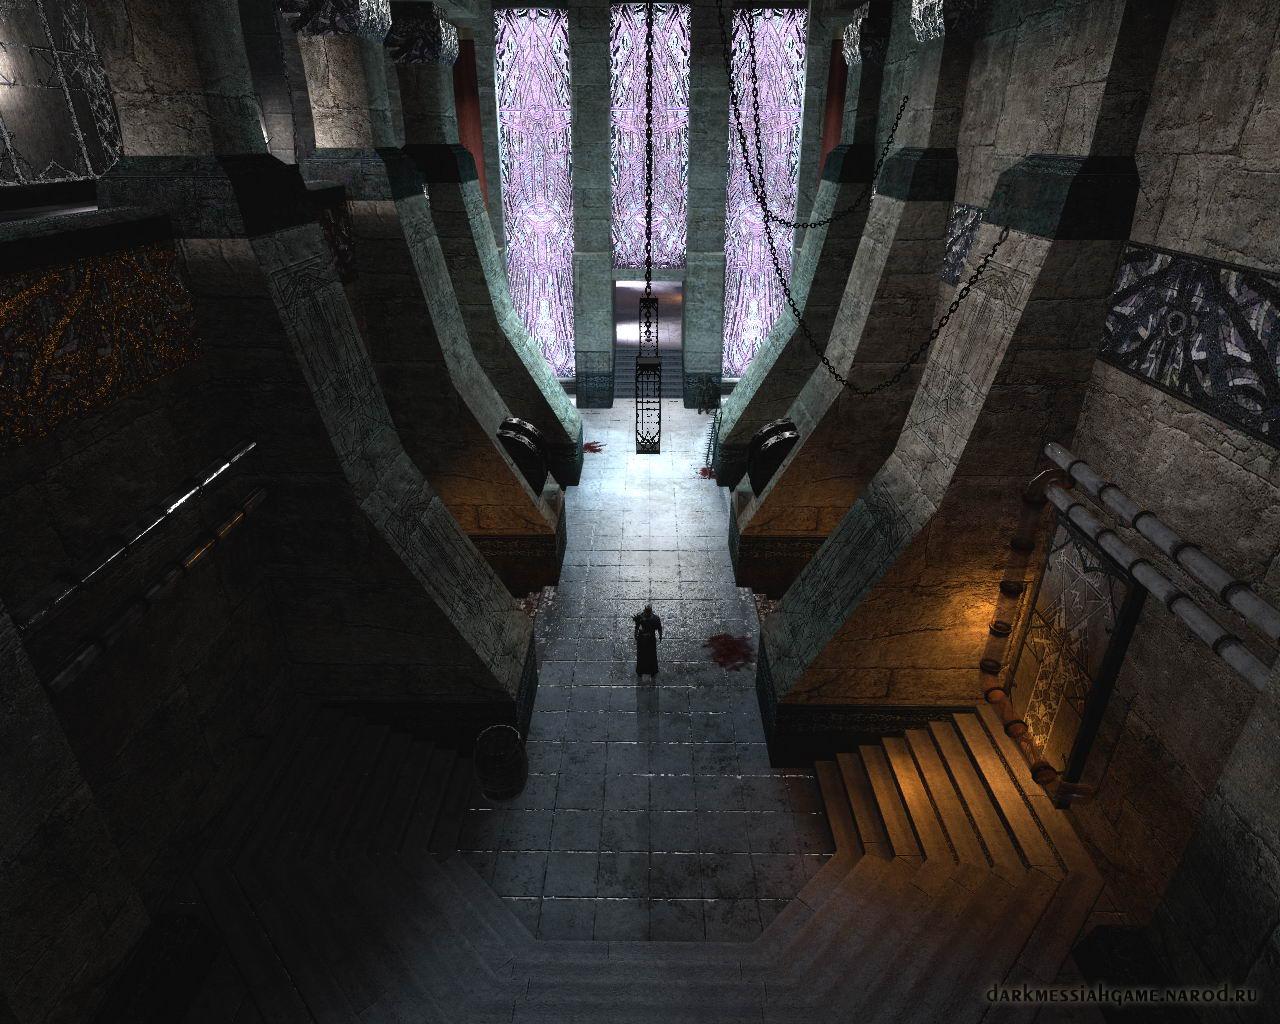 http://darkmessiahgame.narod.ru/img/sol/ll08a_1280x1024.jpg